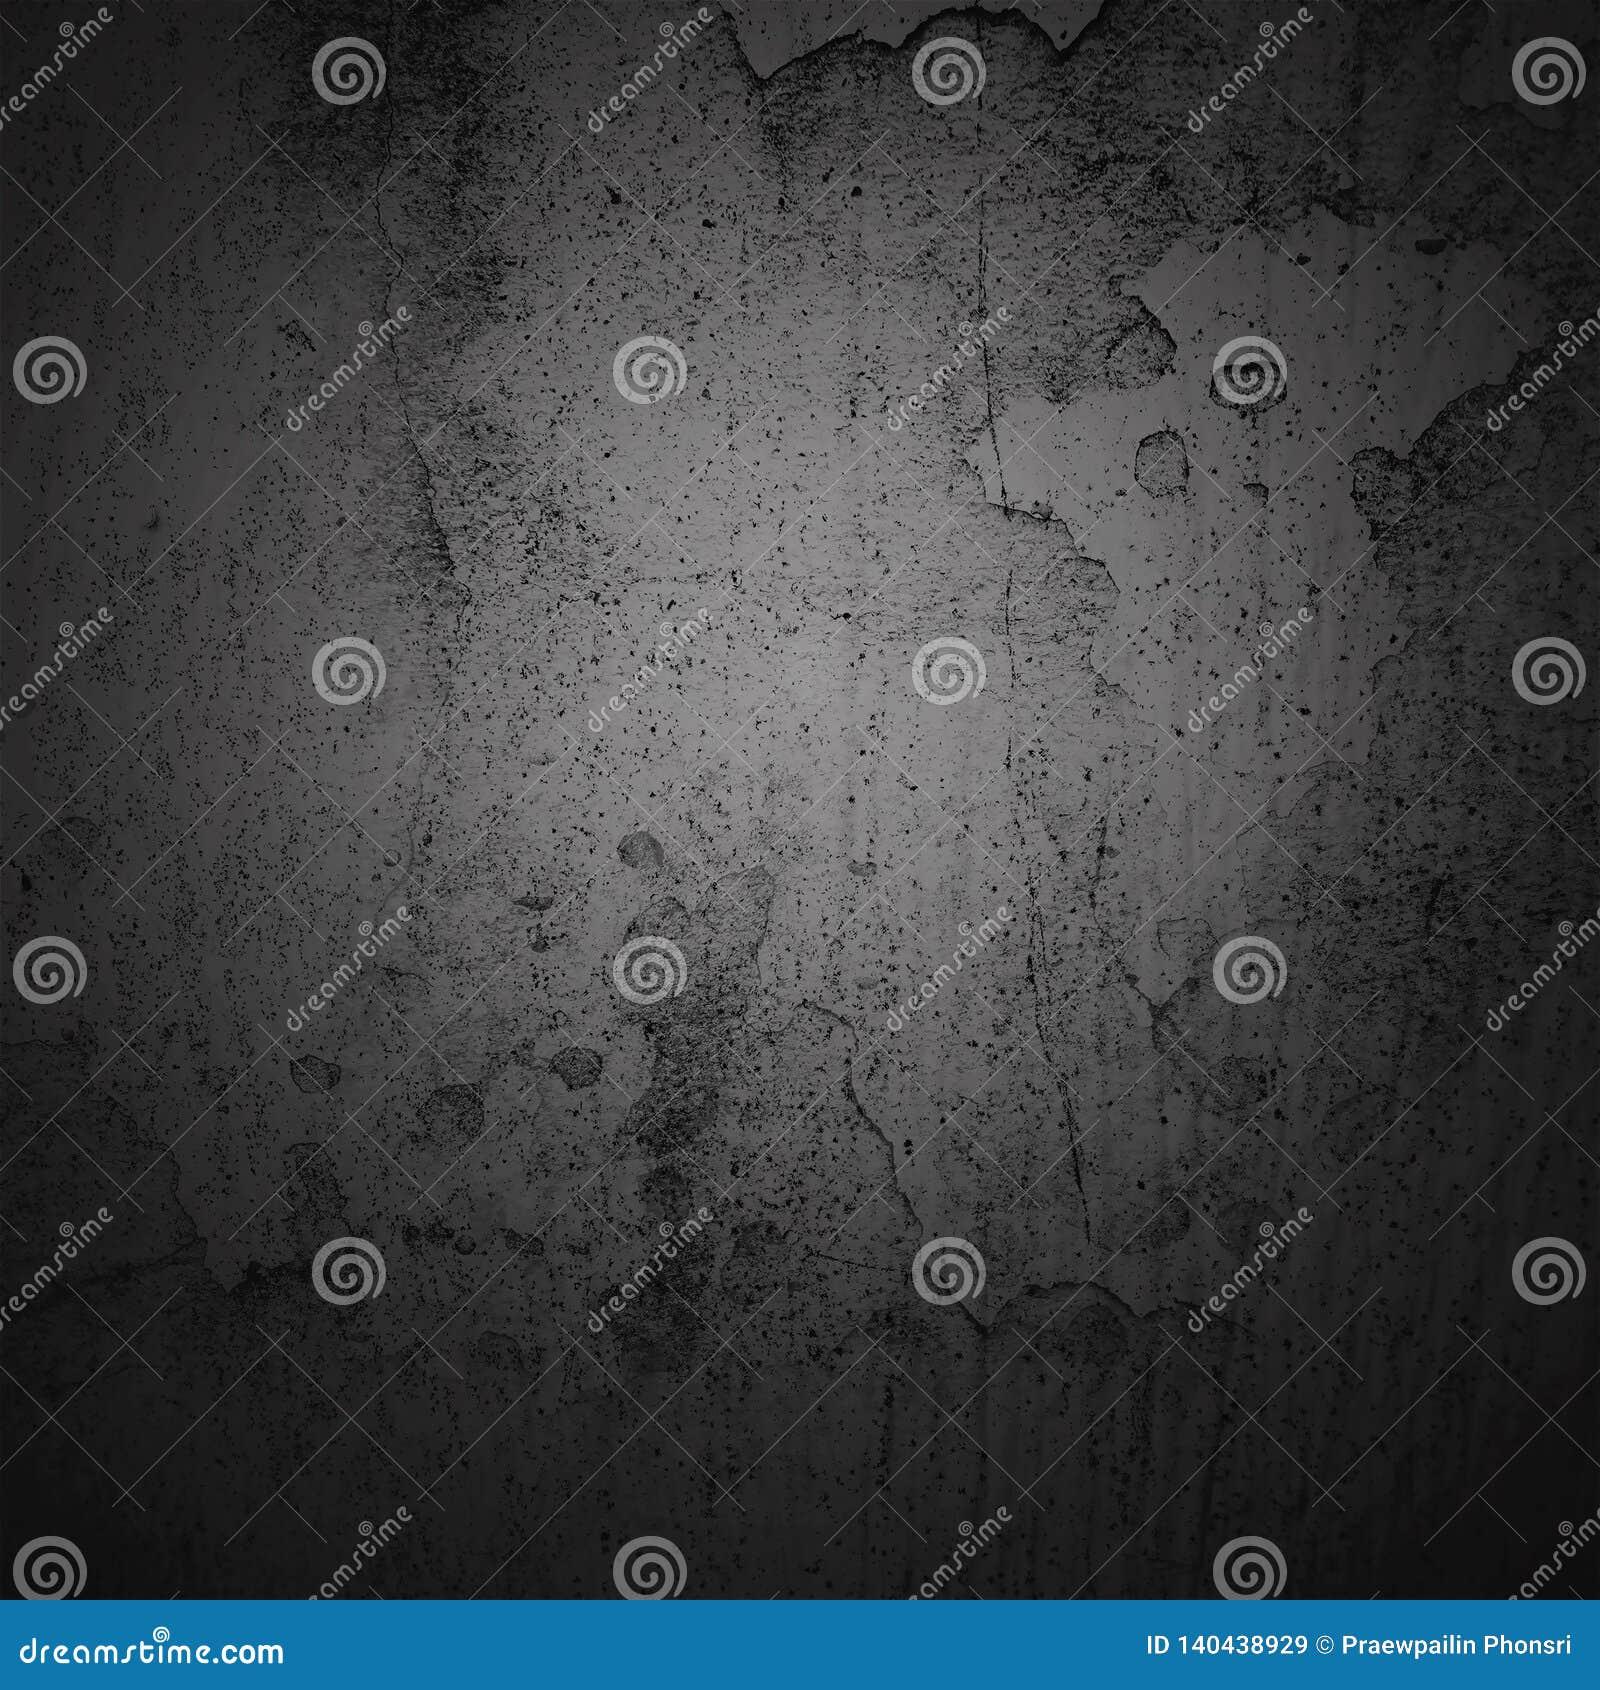 Abstract background dark vignette border frame with gray texture background. Vintage grunge background style